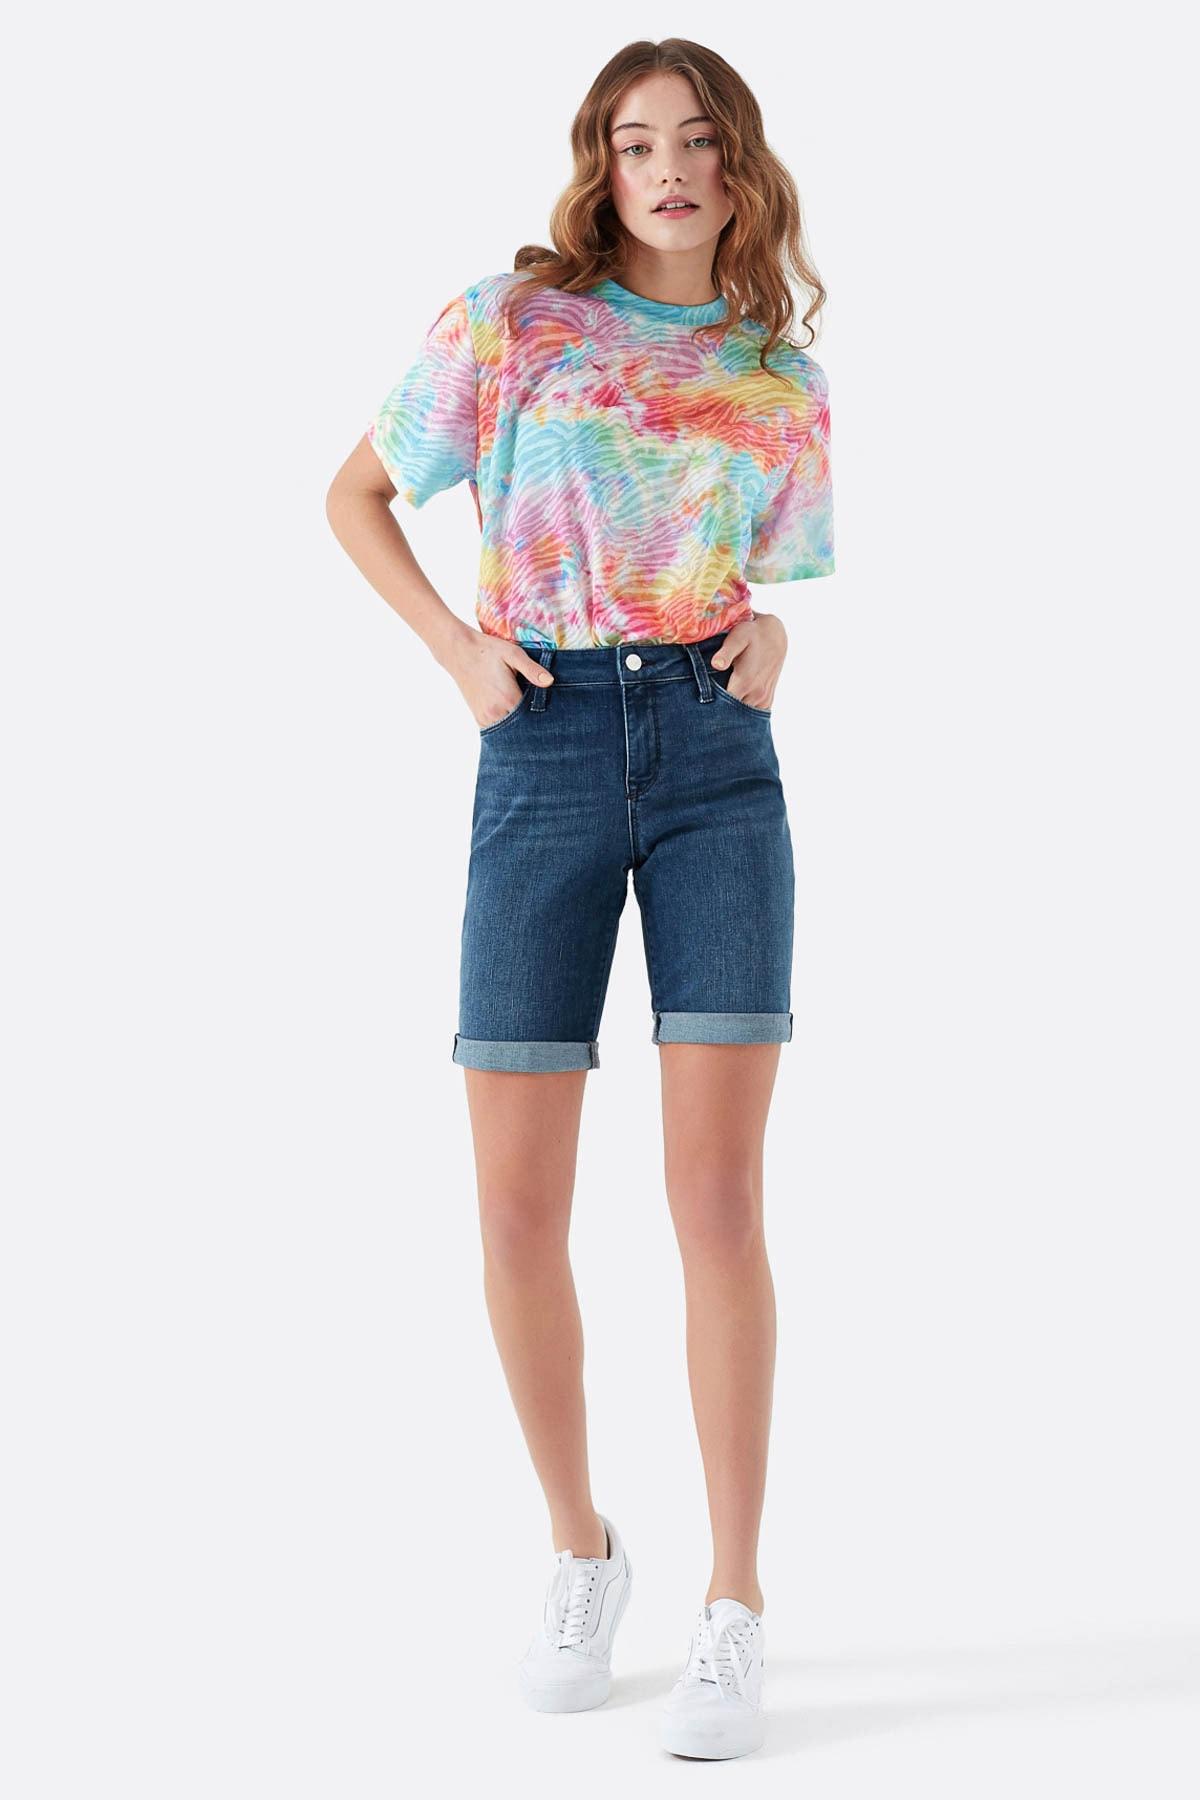 Mavi Kadın Alexis Gold Lux Move Jean Şort 1441528584 1